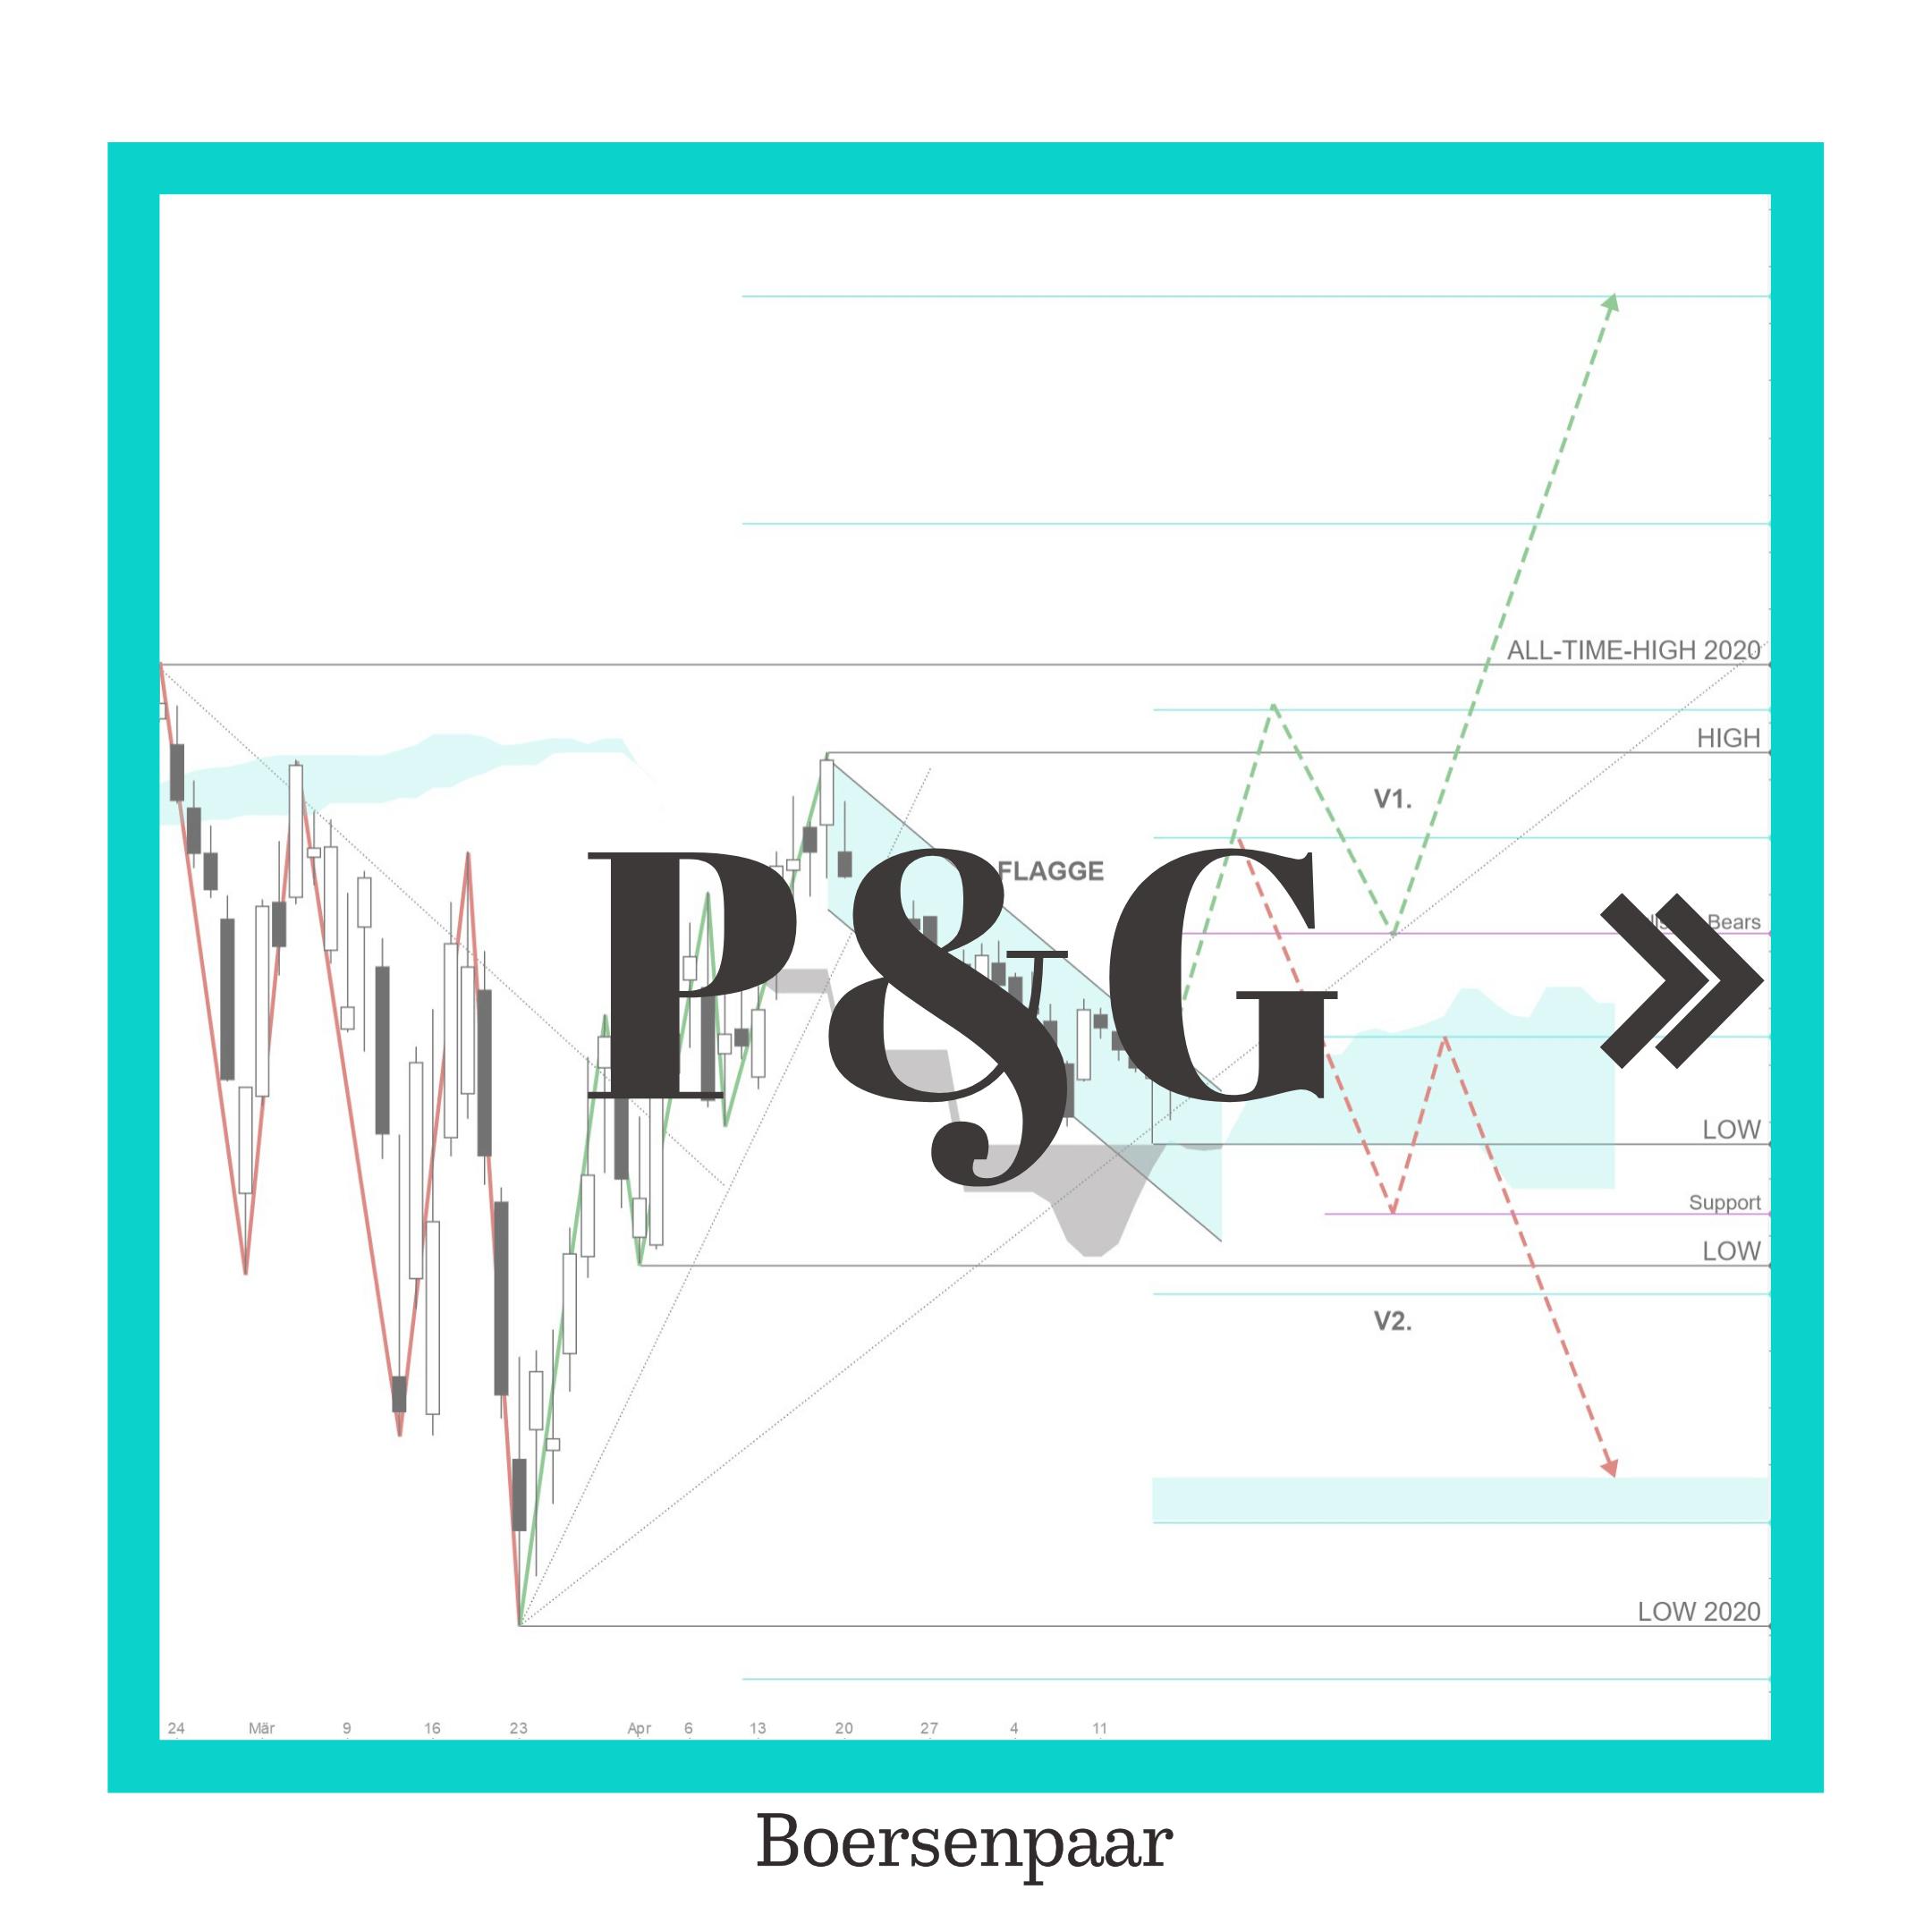 Procter & Gamble Aktien